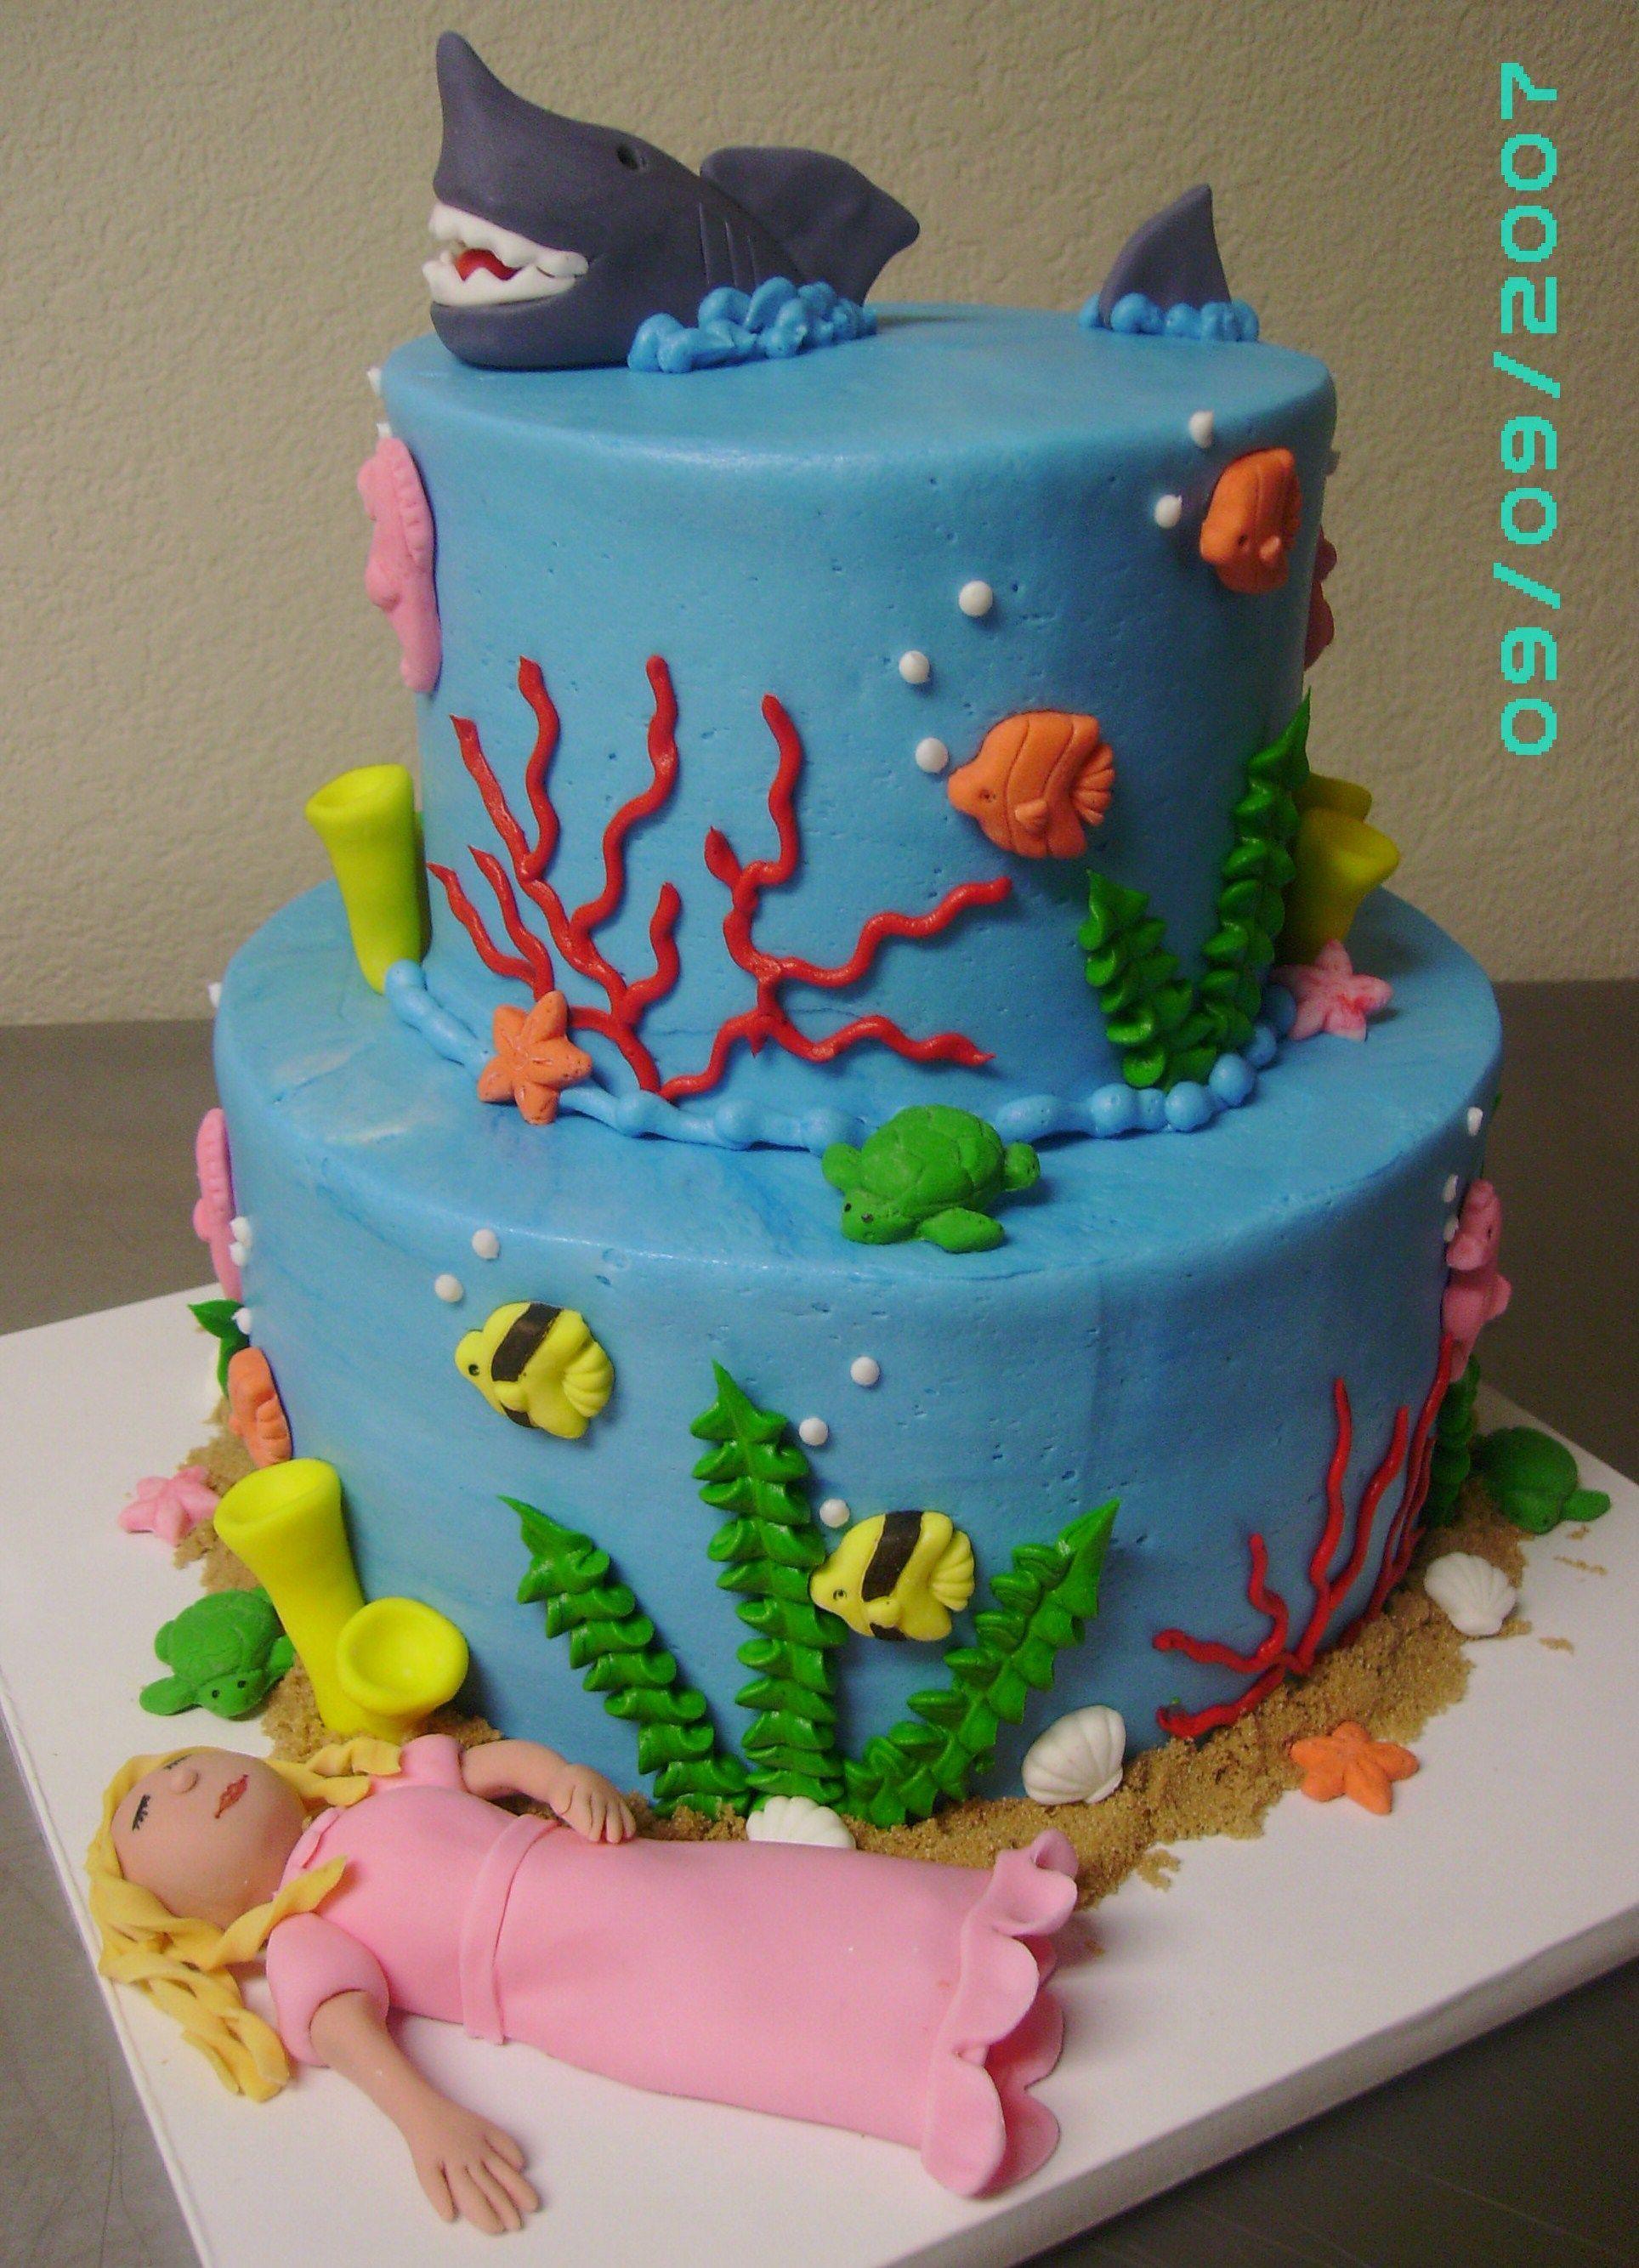 Sleeping with the Sharks Birthday Cake - cute fish